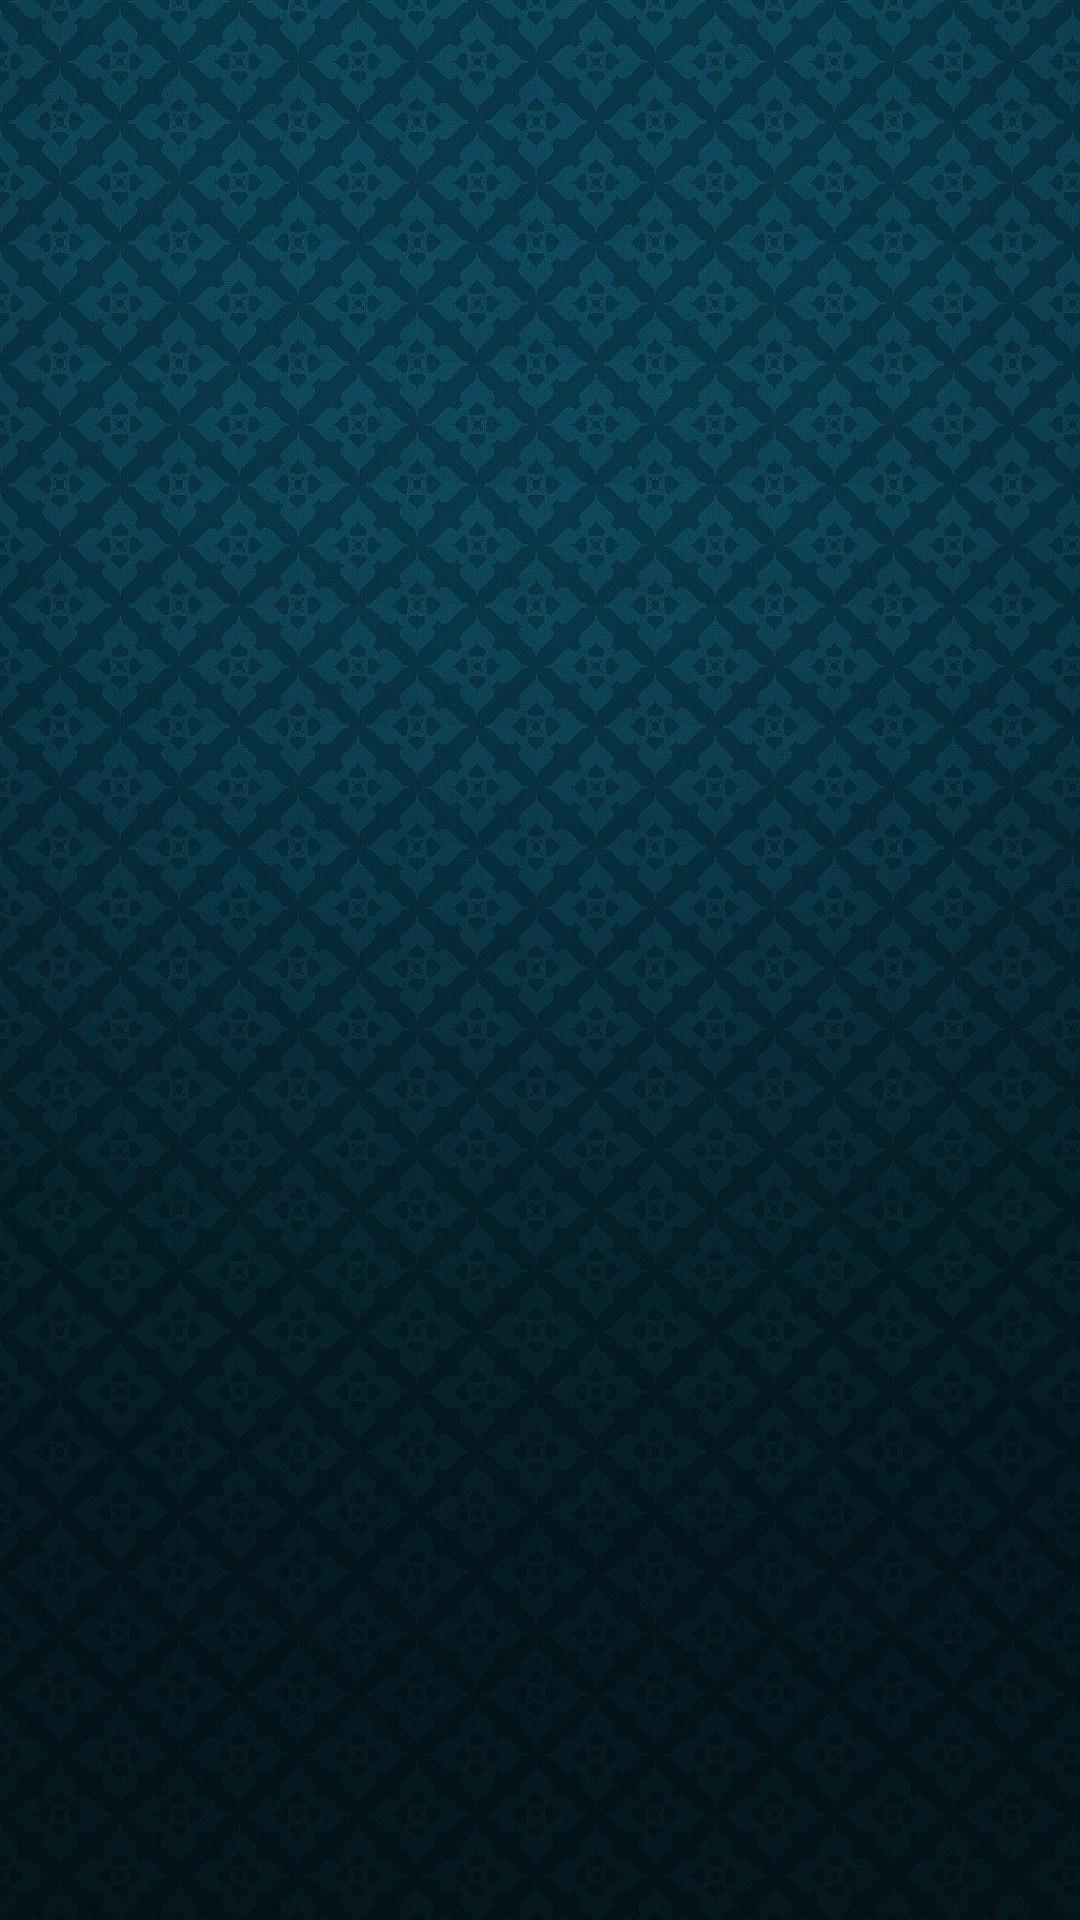 Gallery of Blue Iphone Wallpaper 8211 Nintendo Green Blue Gradation Blur Iphone  6 Wallpaper